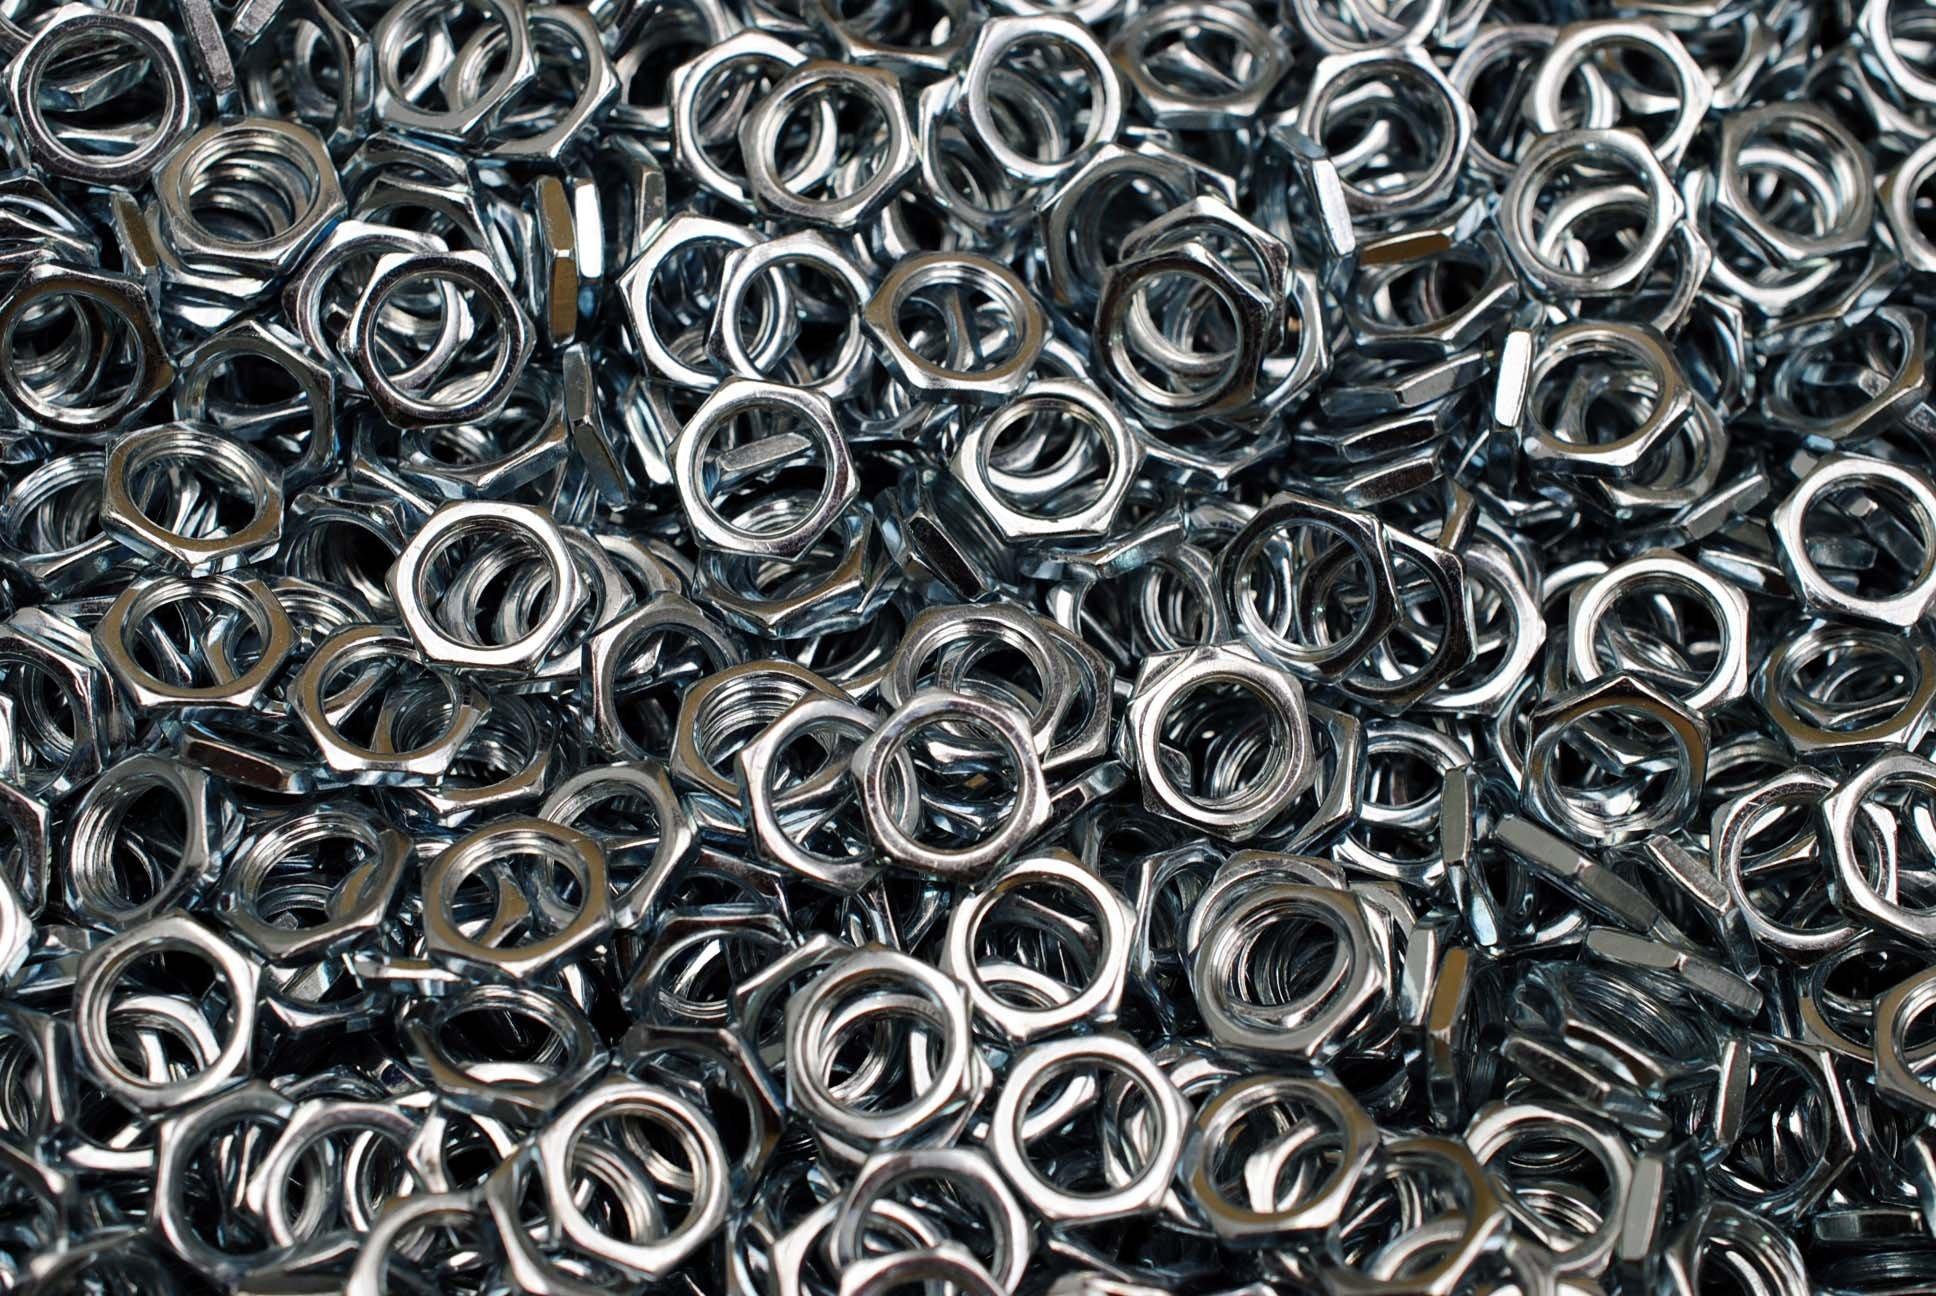 (500) Hex Panel Nuts 3/8-32 Extra Fine Thread - Zinc Plated 3/8-32 x 3/32 x 1/2